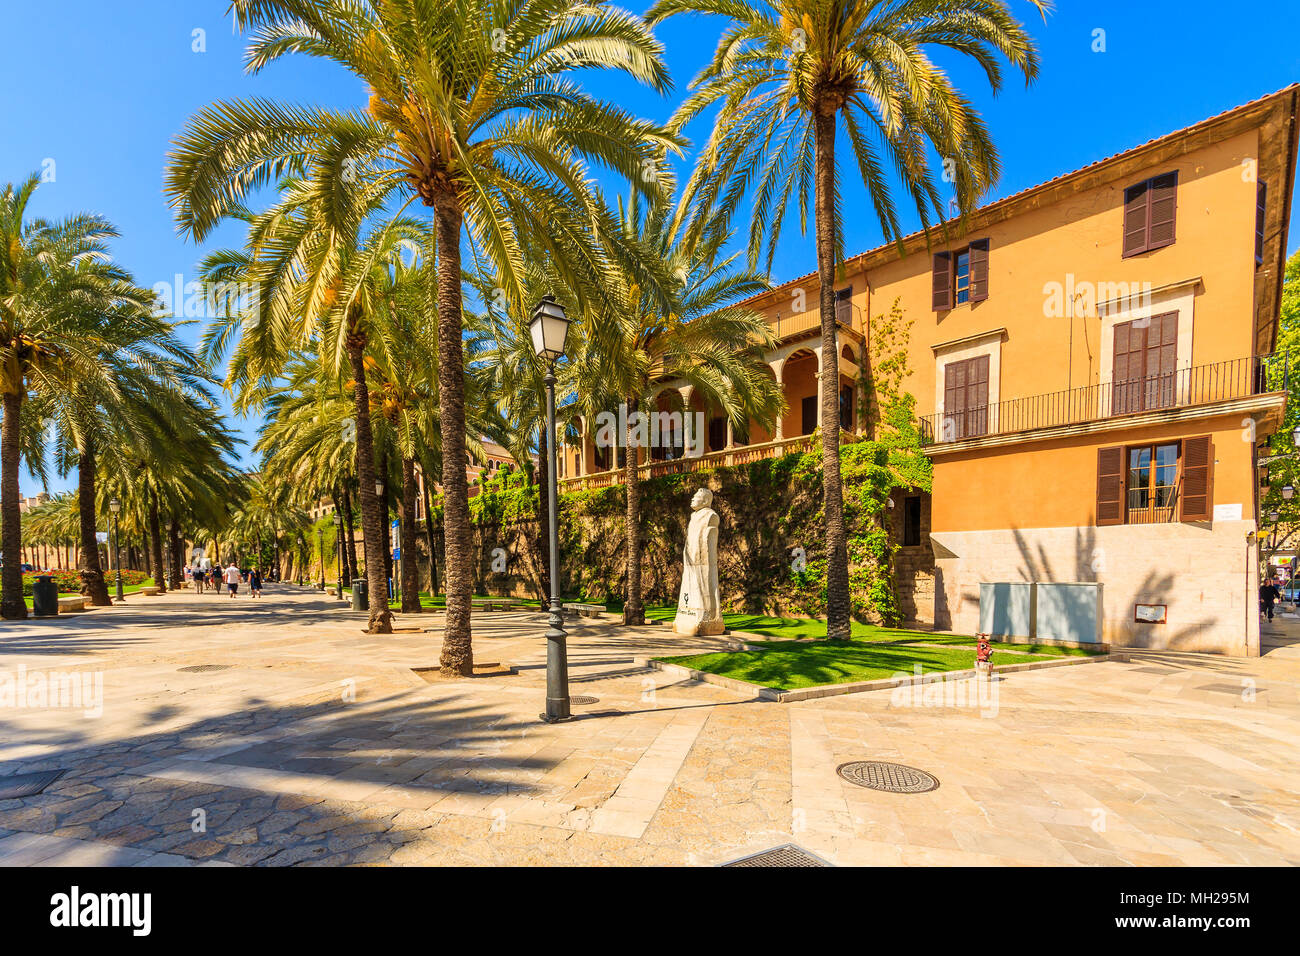 MAJORCA ISLAND, SPAIN - APR 13, 2013: Colorful historic buildings in old town of Palma de Majorca, capital of the island, very popular tourist destina - Stock Image